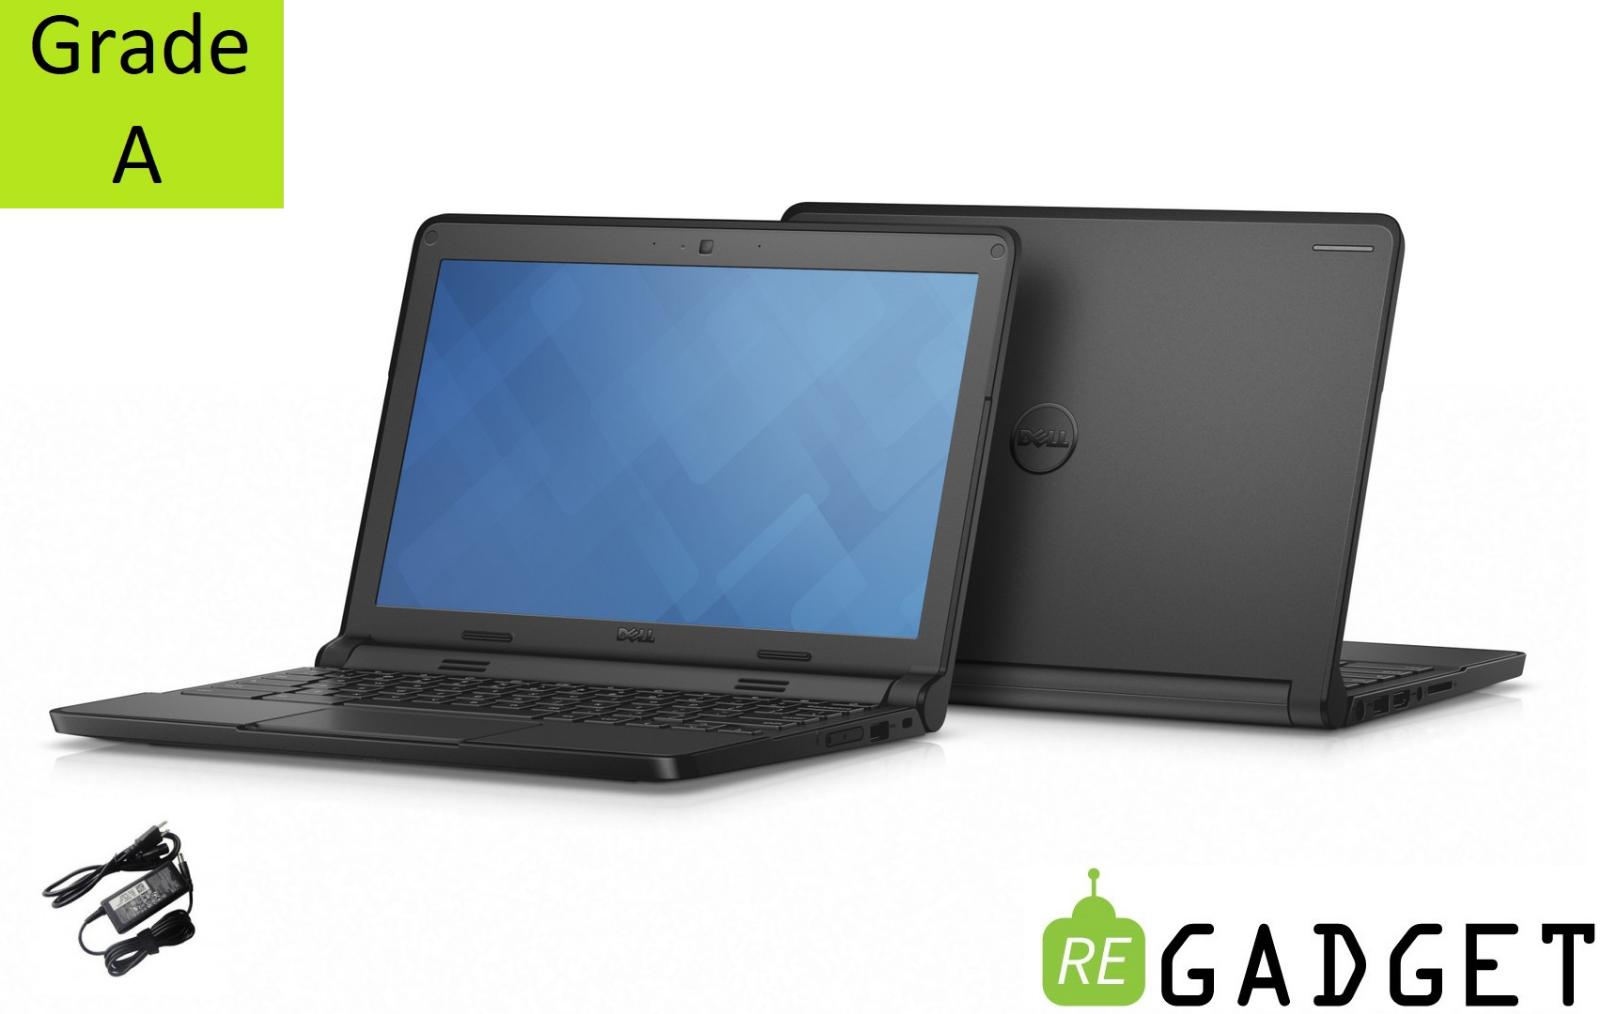 CHROMEBOOK Dell LAPTOP Notebook 4GB Intel 16GB ssd HDMI Webcam WiFi Chrome OS HD